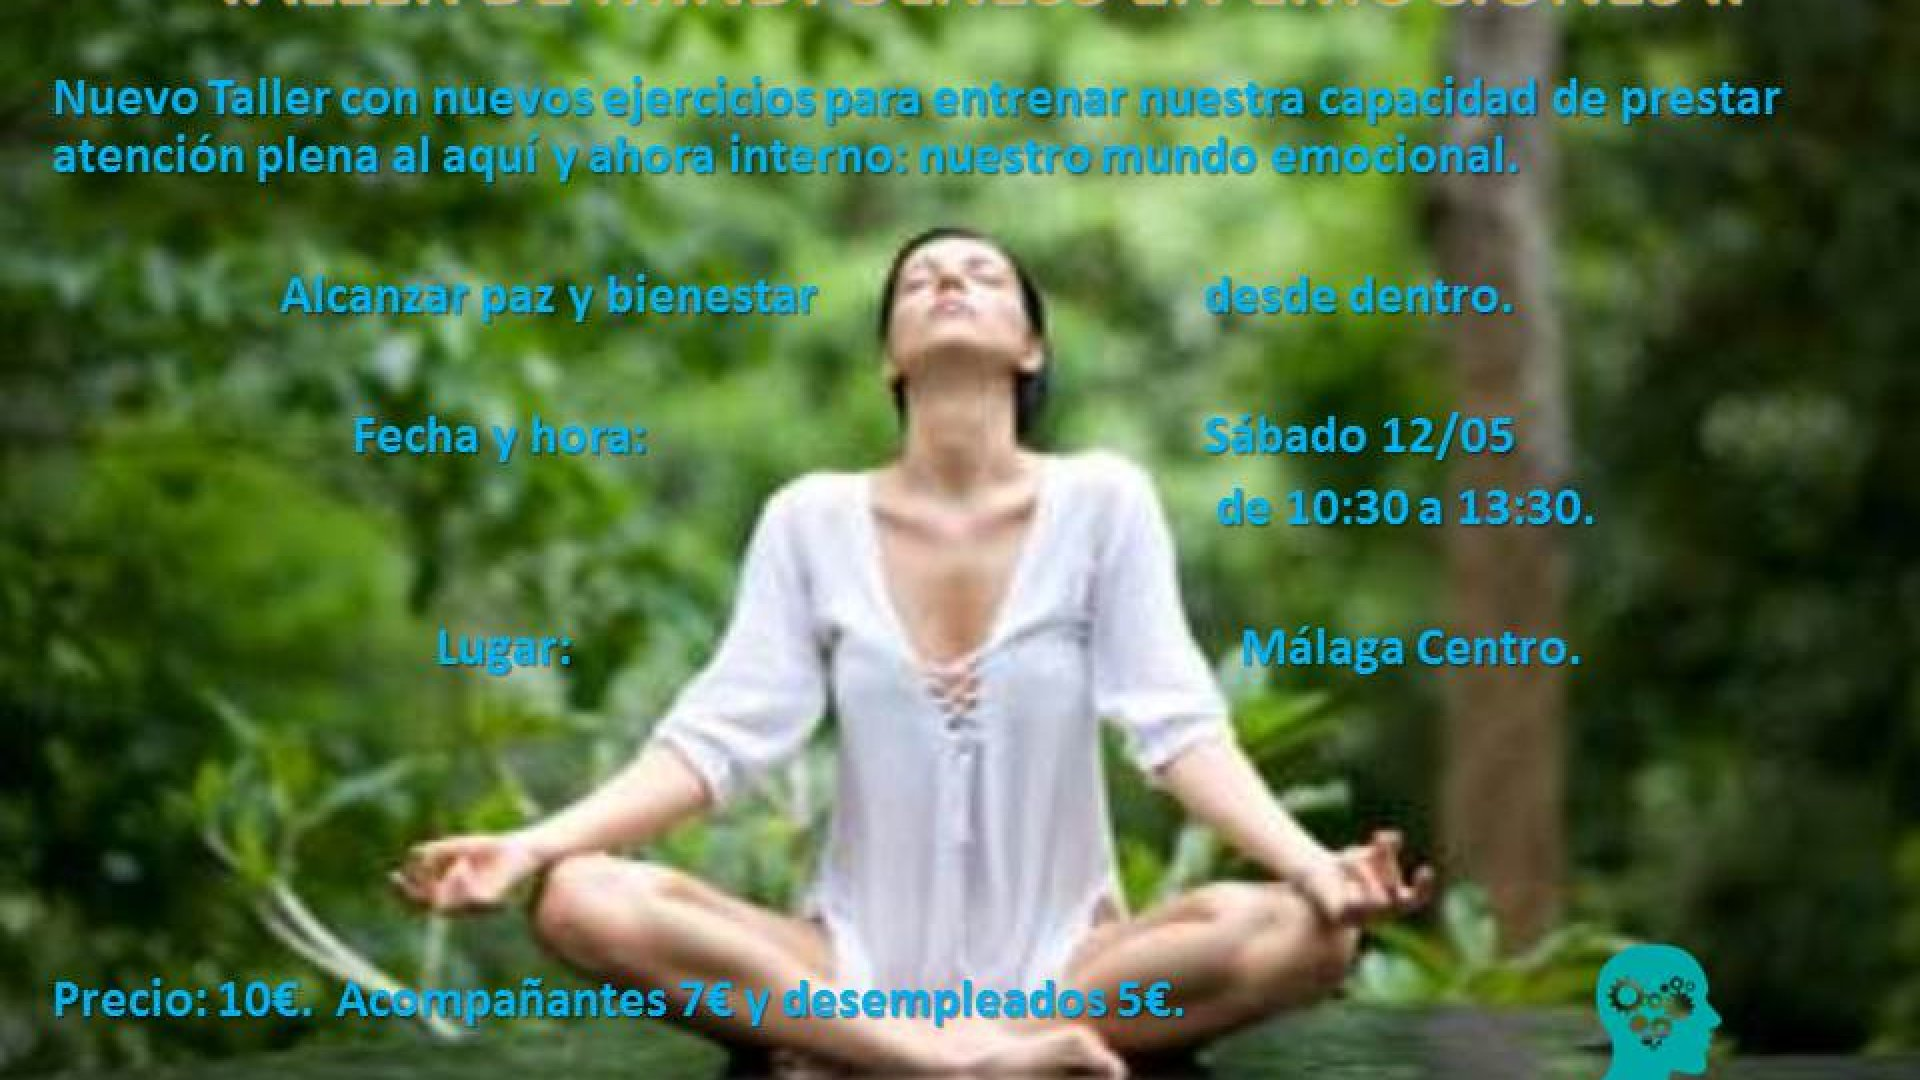 TALLER DE MINDFULNESS EN EMOCIONES II